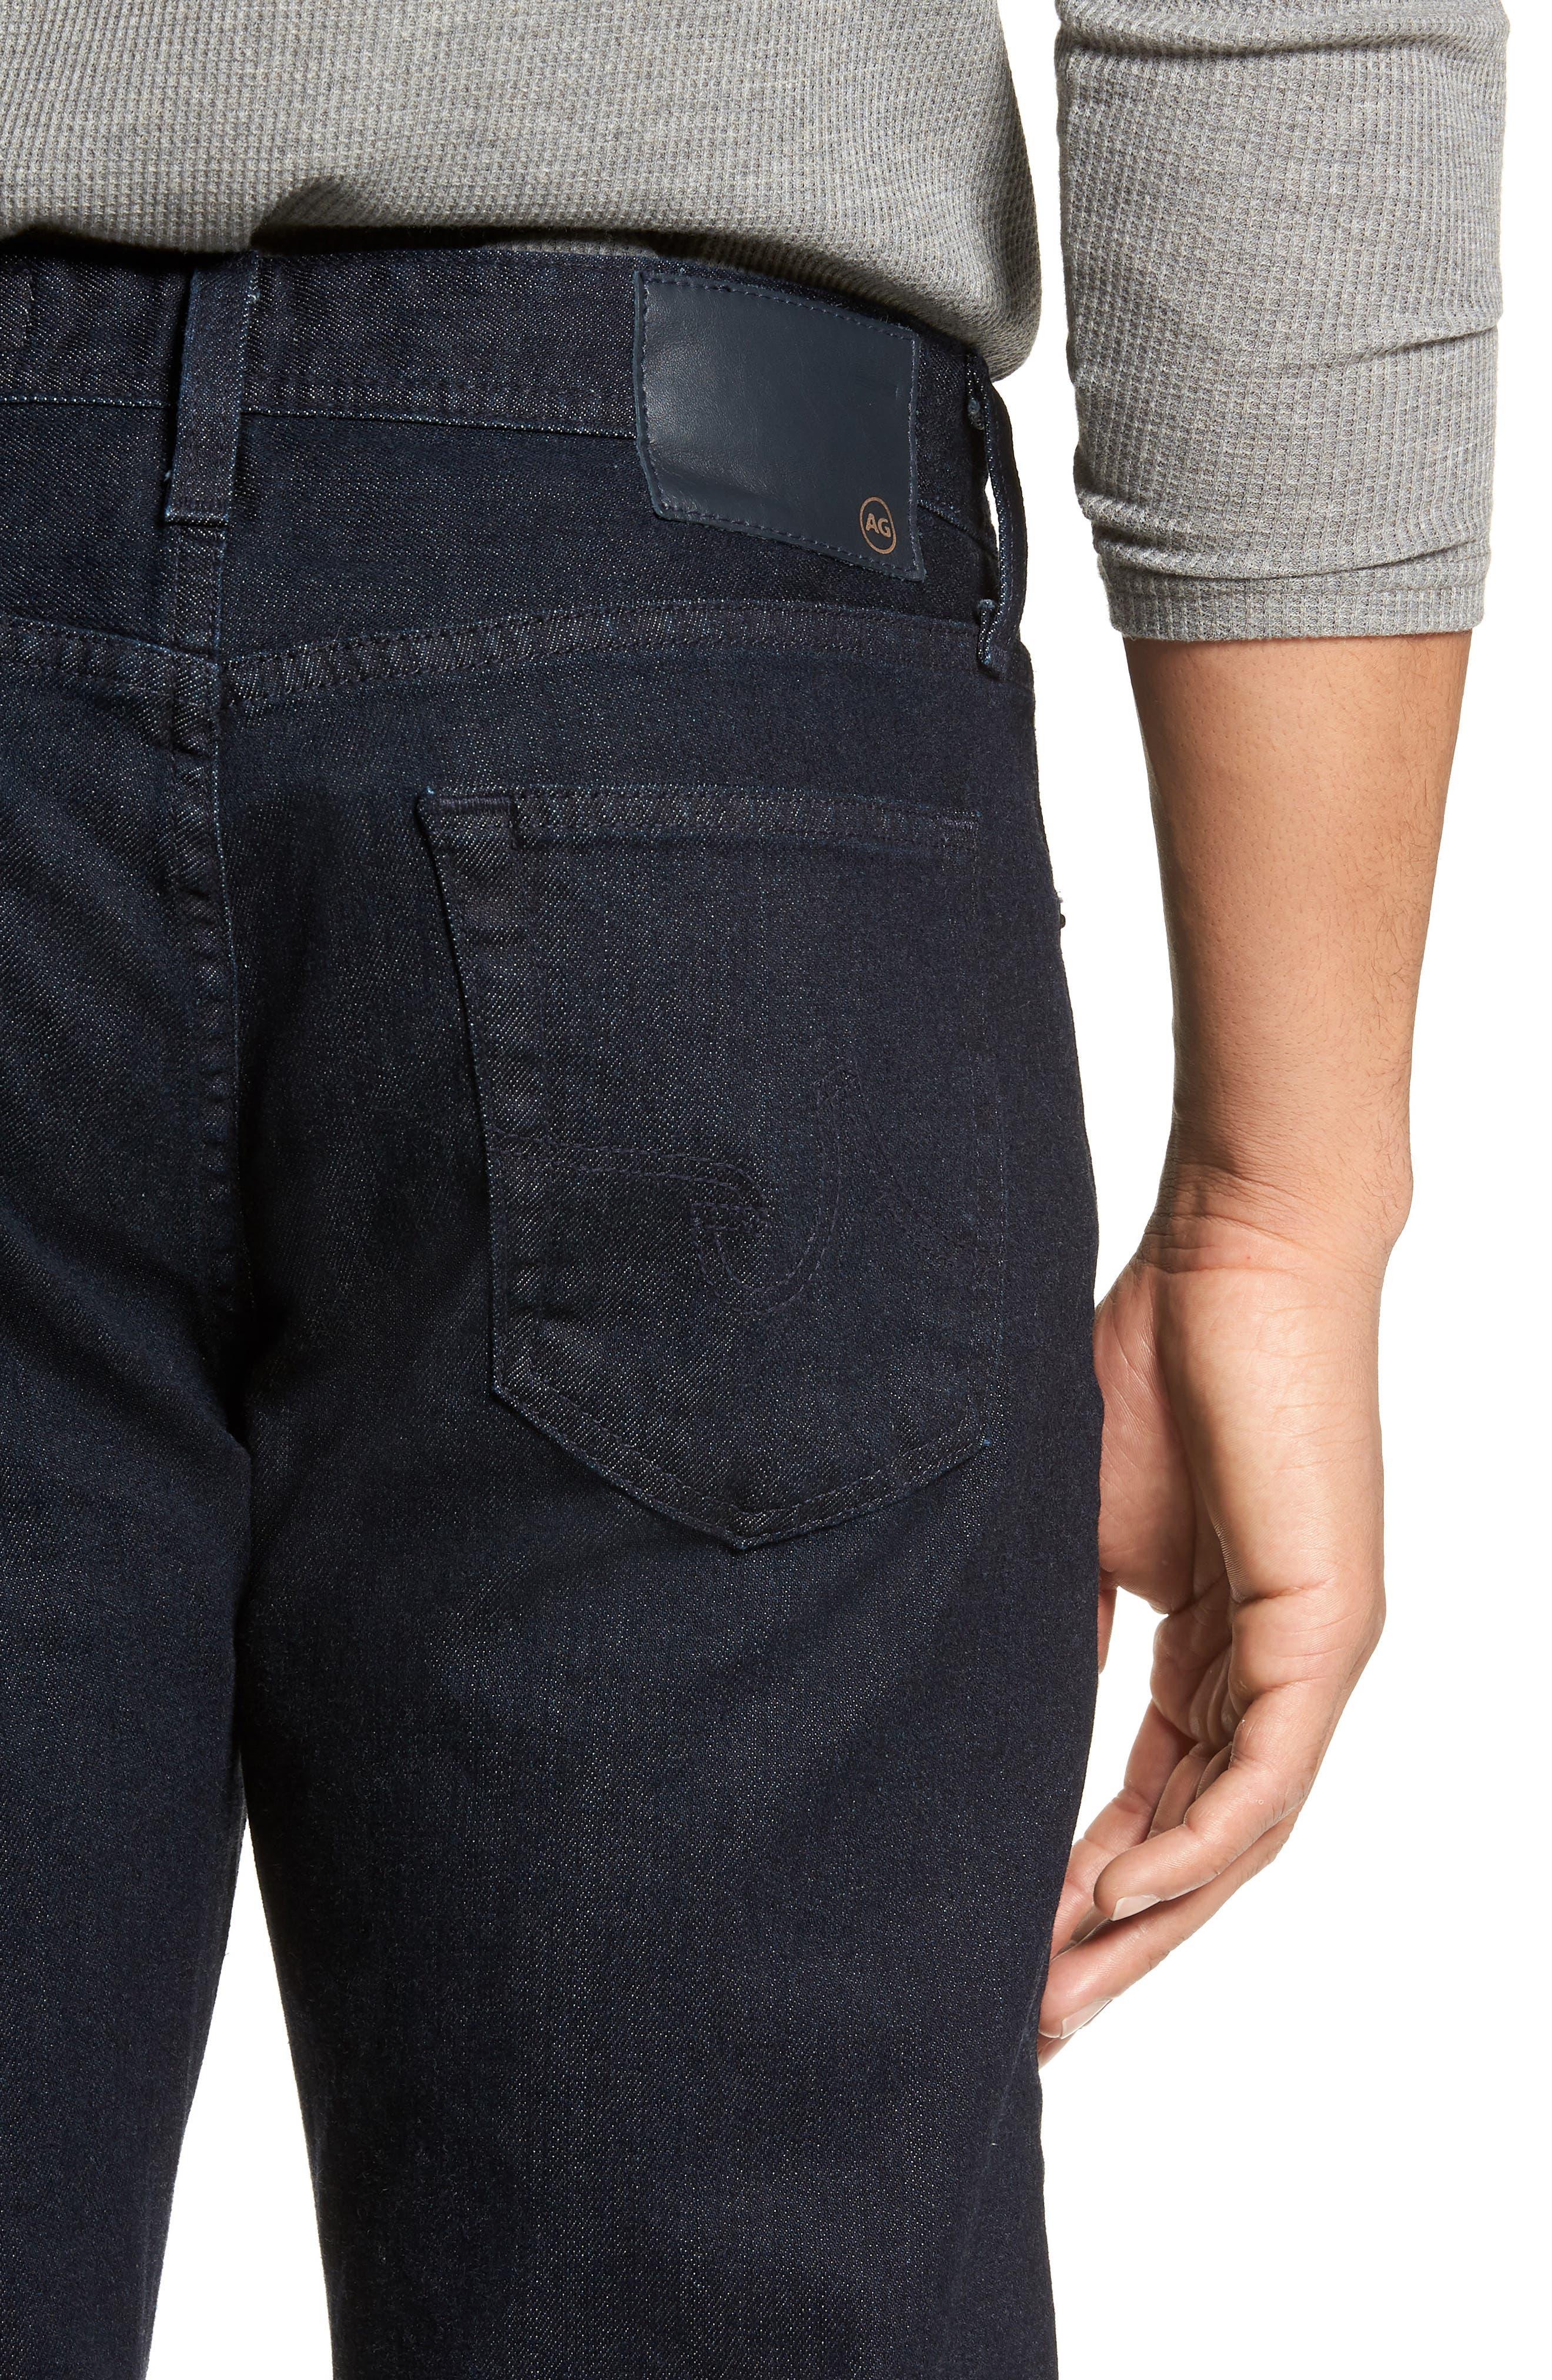 Graduate Slim Straight Leg Jeans,                             Alternate thumbnail 4, color,                             STELLAR